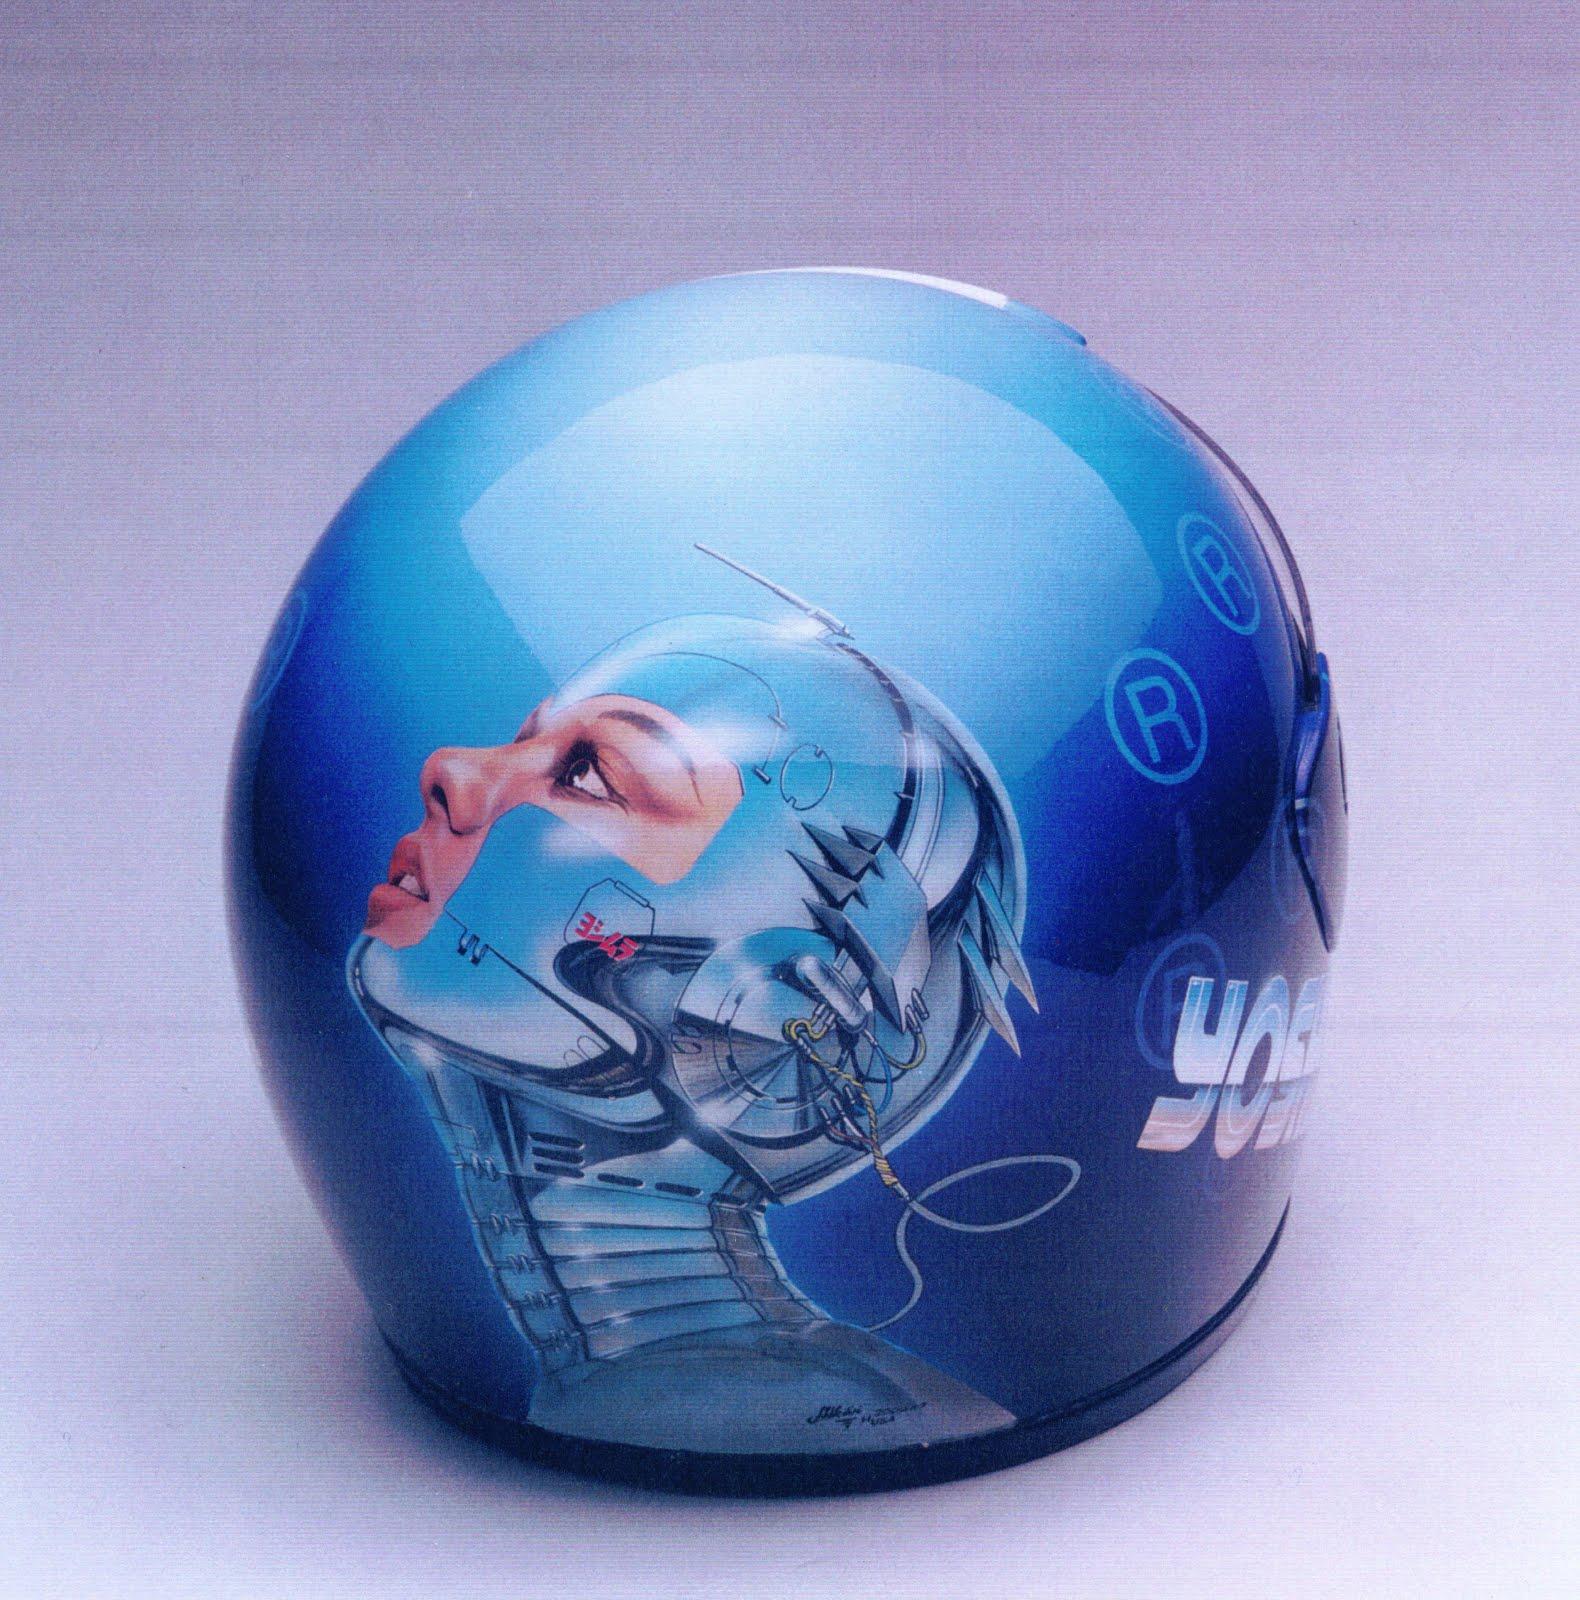 Yoshimura Helmet